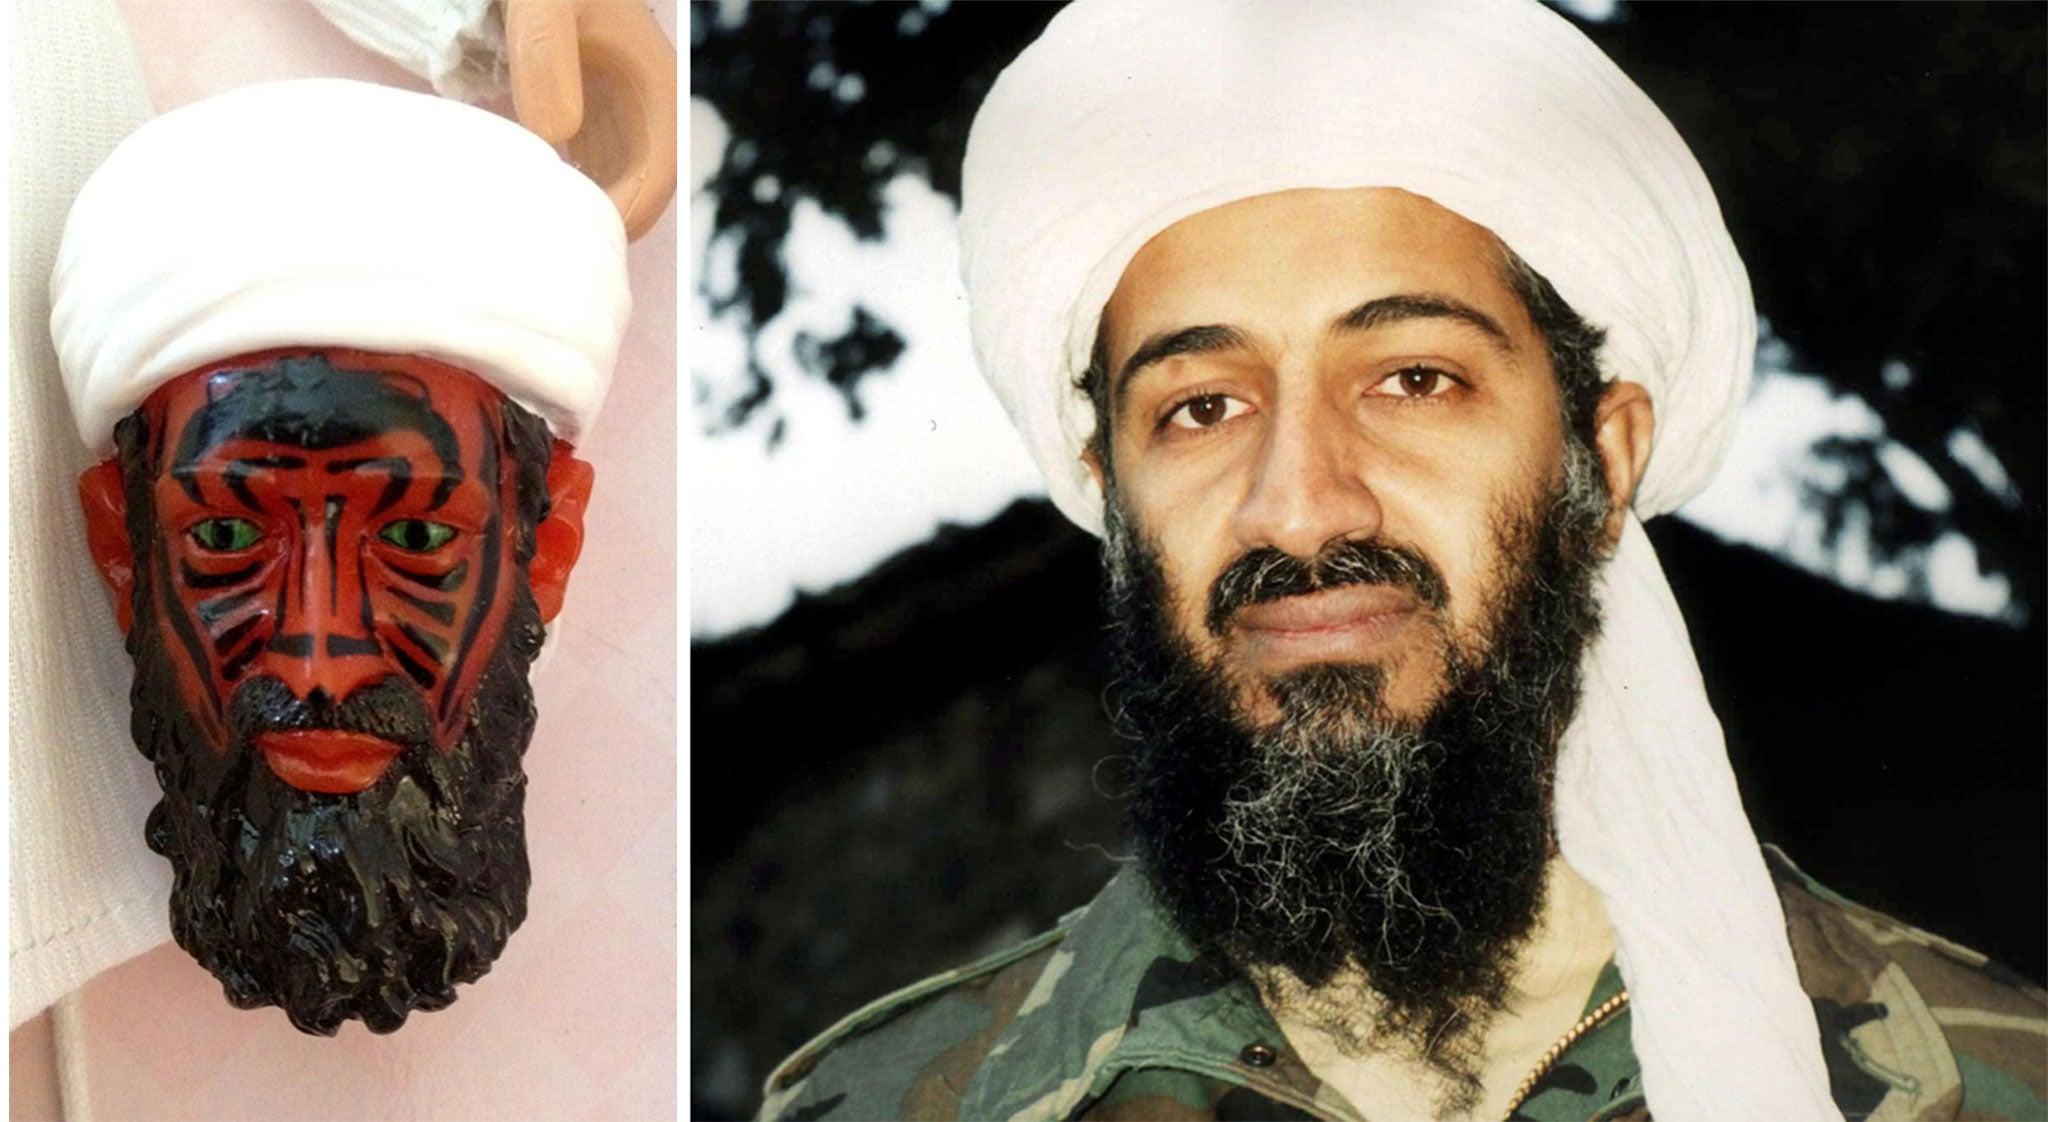 CIA Created Demonic Osama Bin Laden Toy To Turn Children